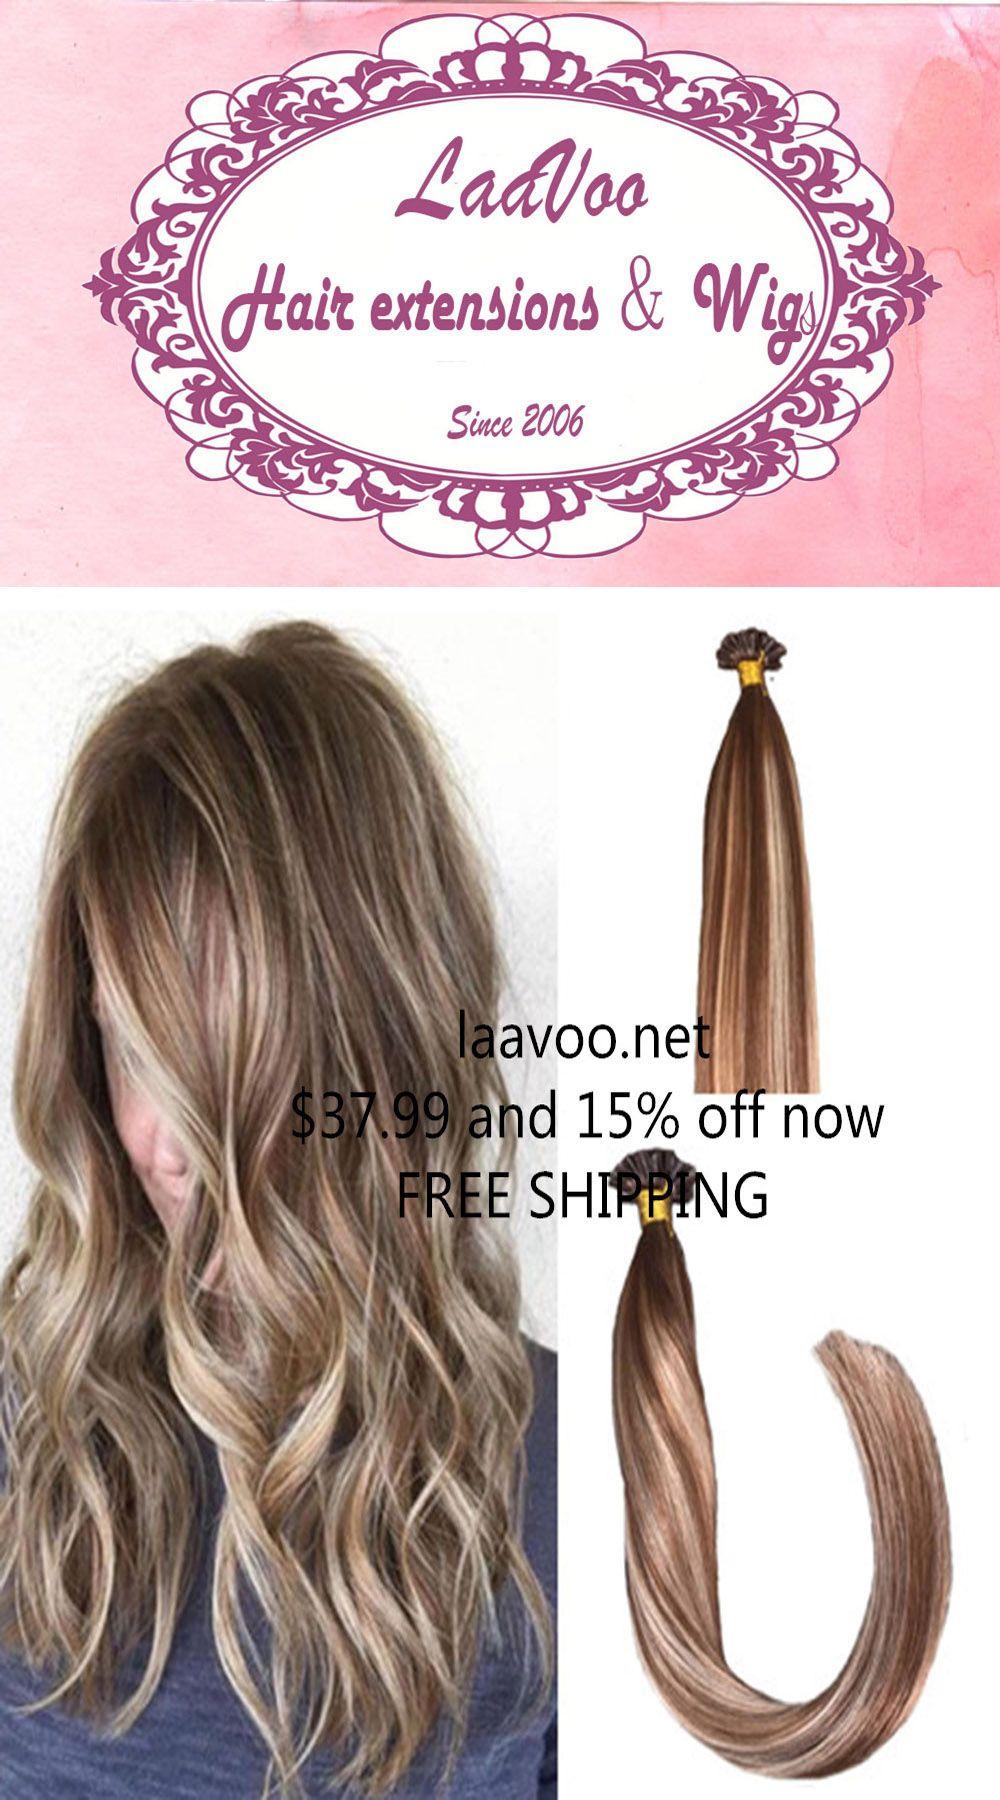 I Tip Balayage Human Hair Extensions See Morehttpslaavoo